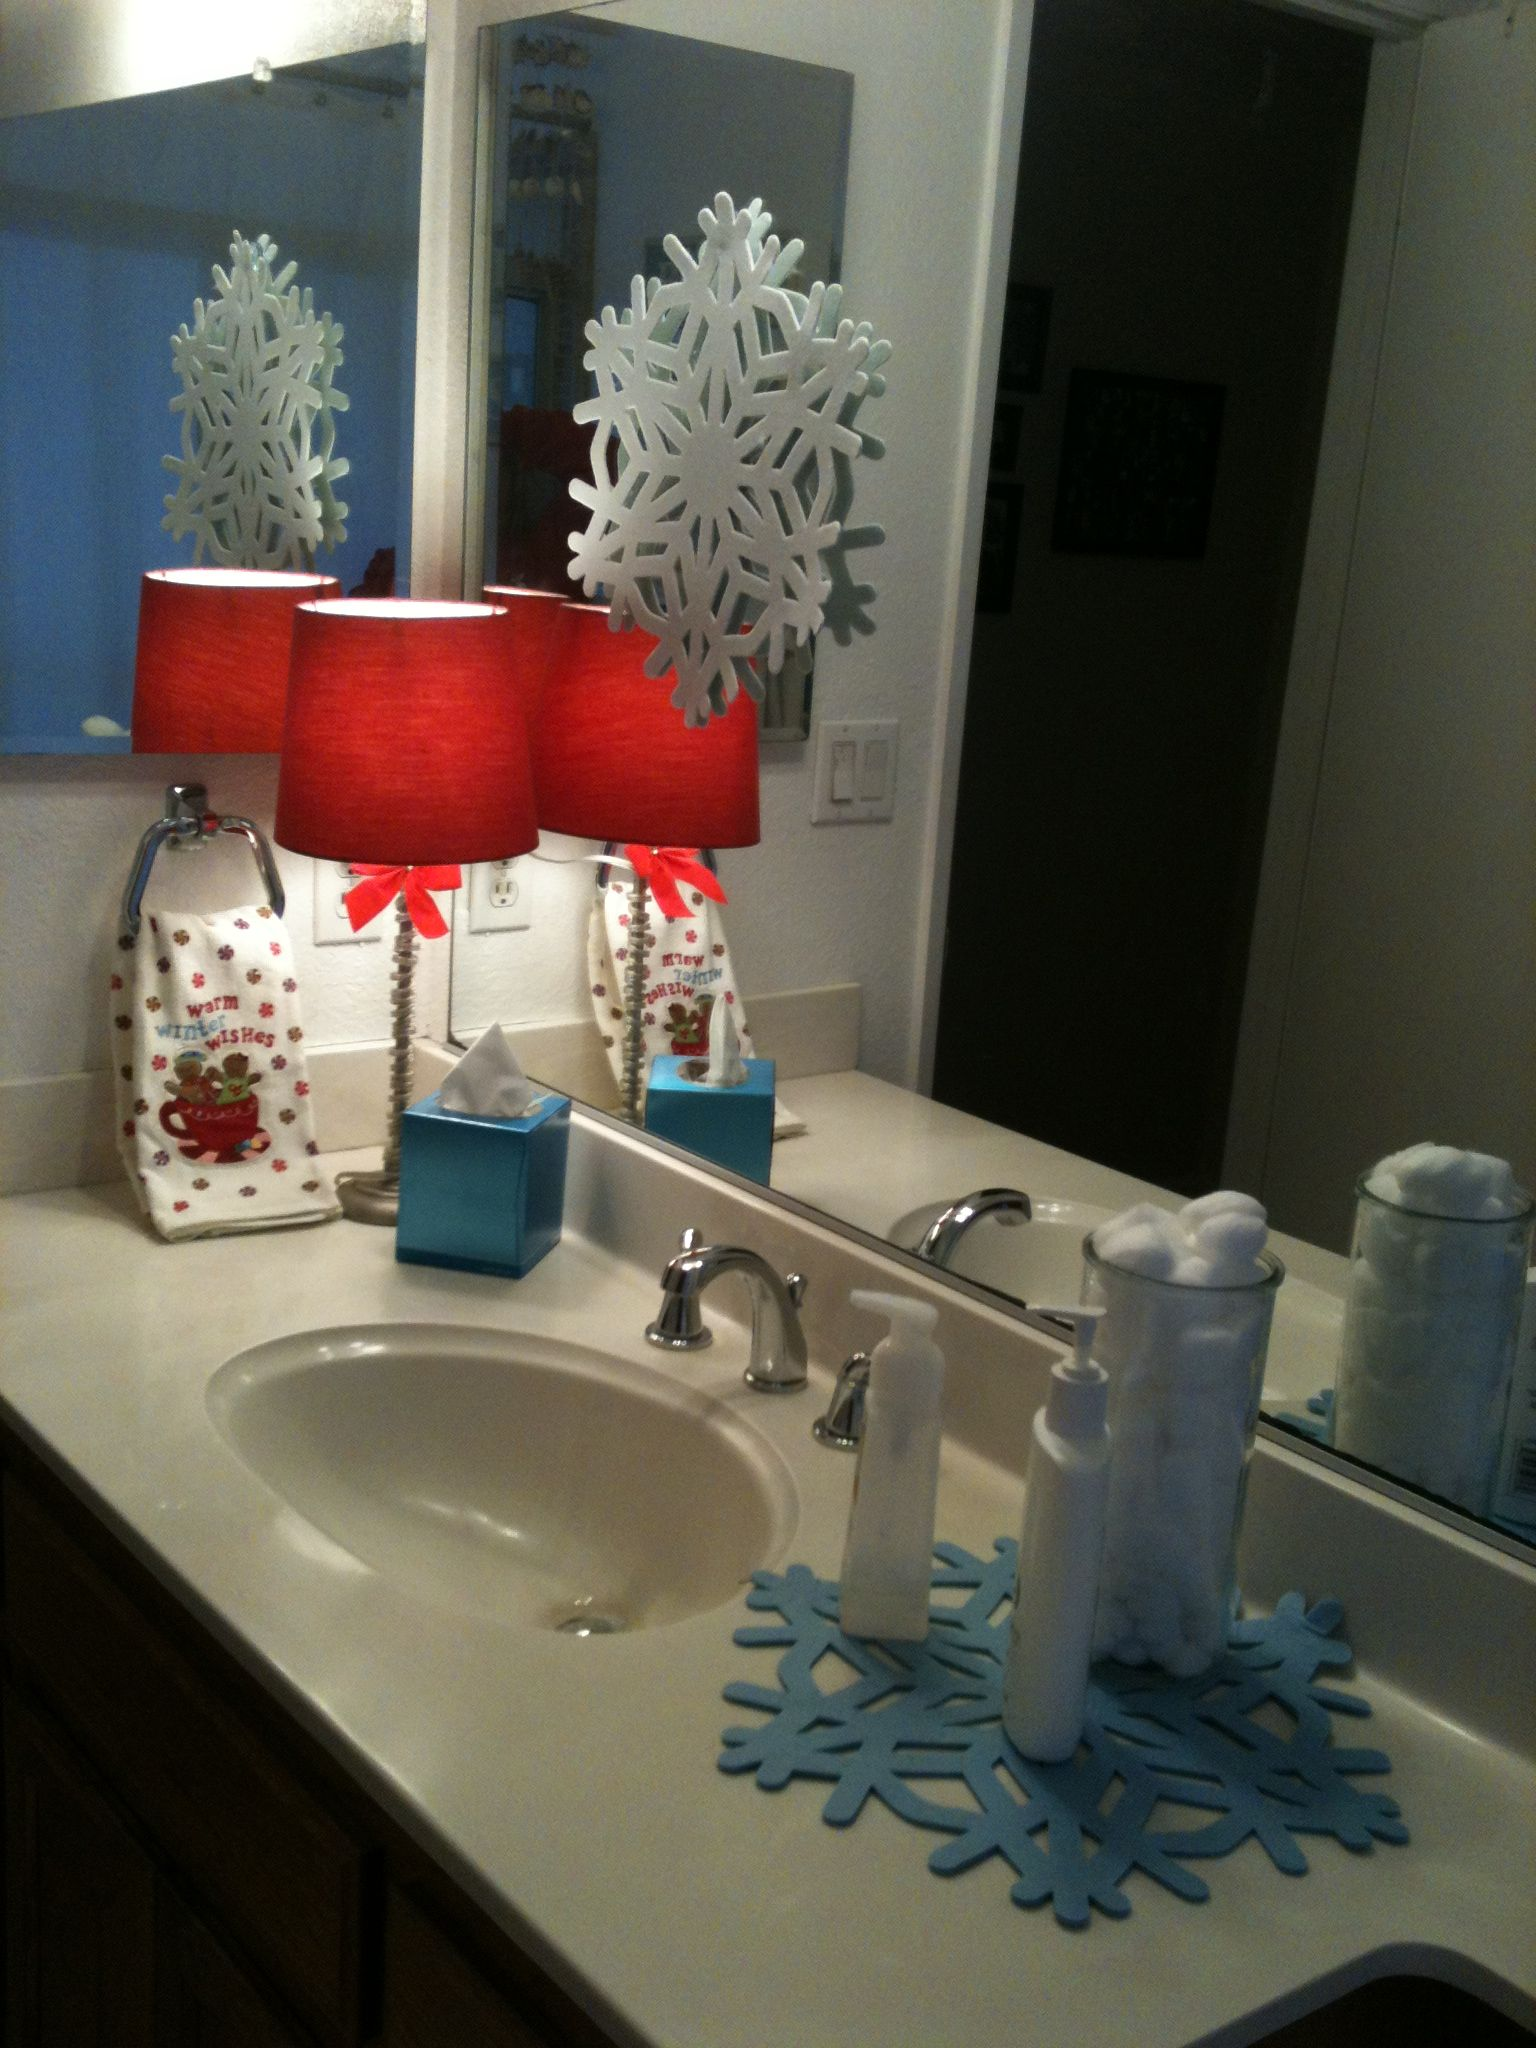 SnowFlakes as Holiday Bathroom Decorations. | Holiday ~ Christmas ...